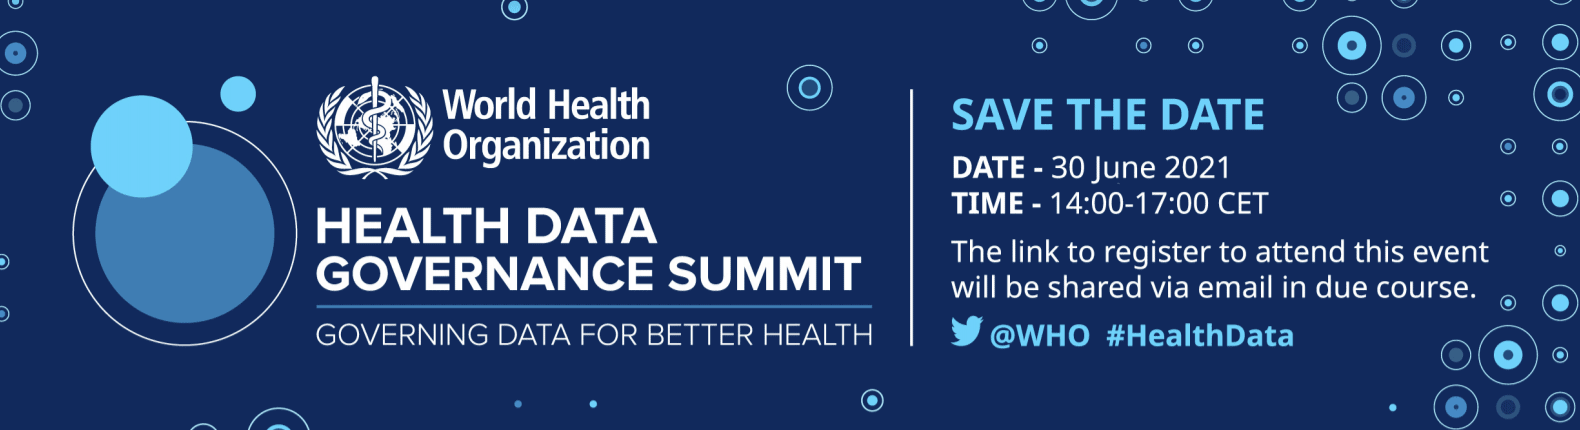 Health Data Governance Summit 1